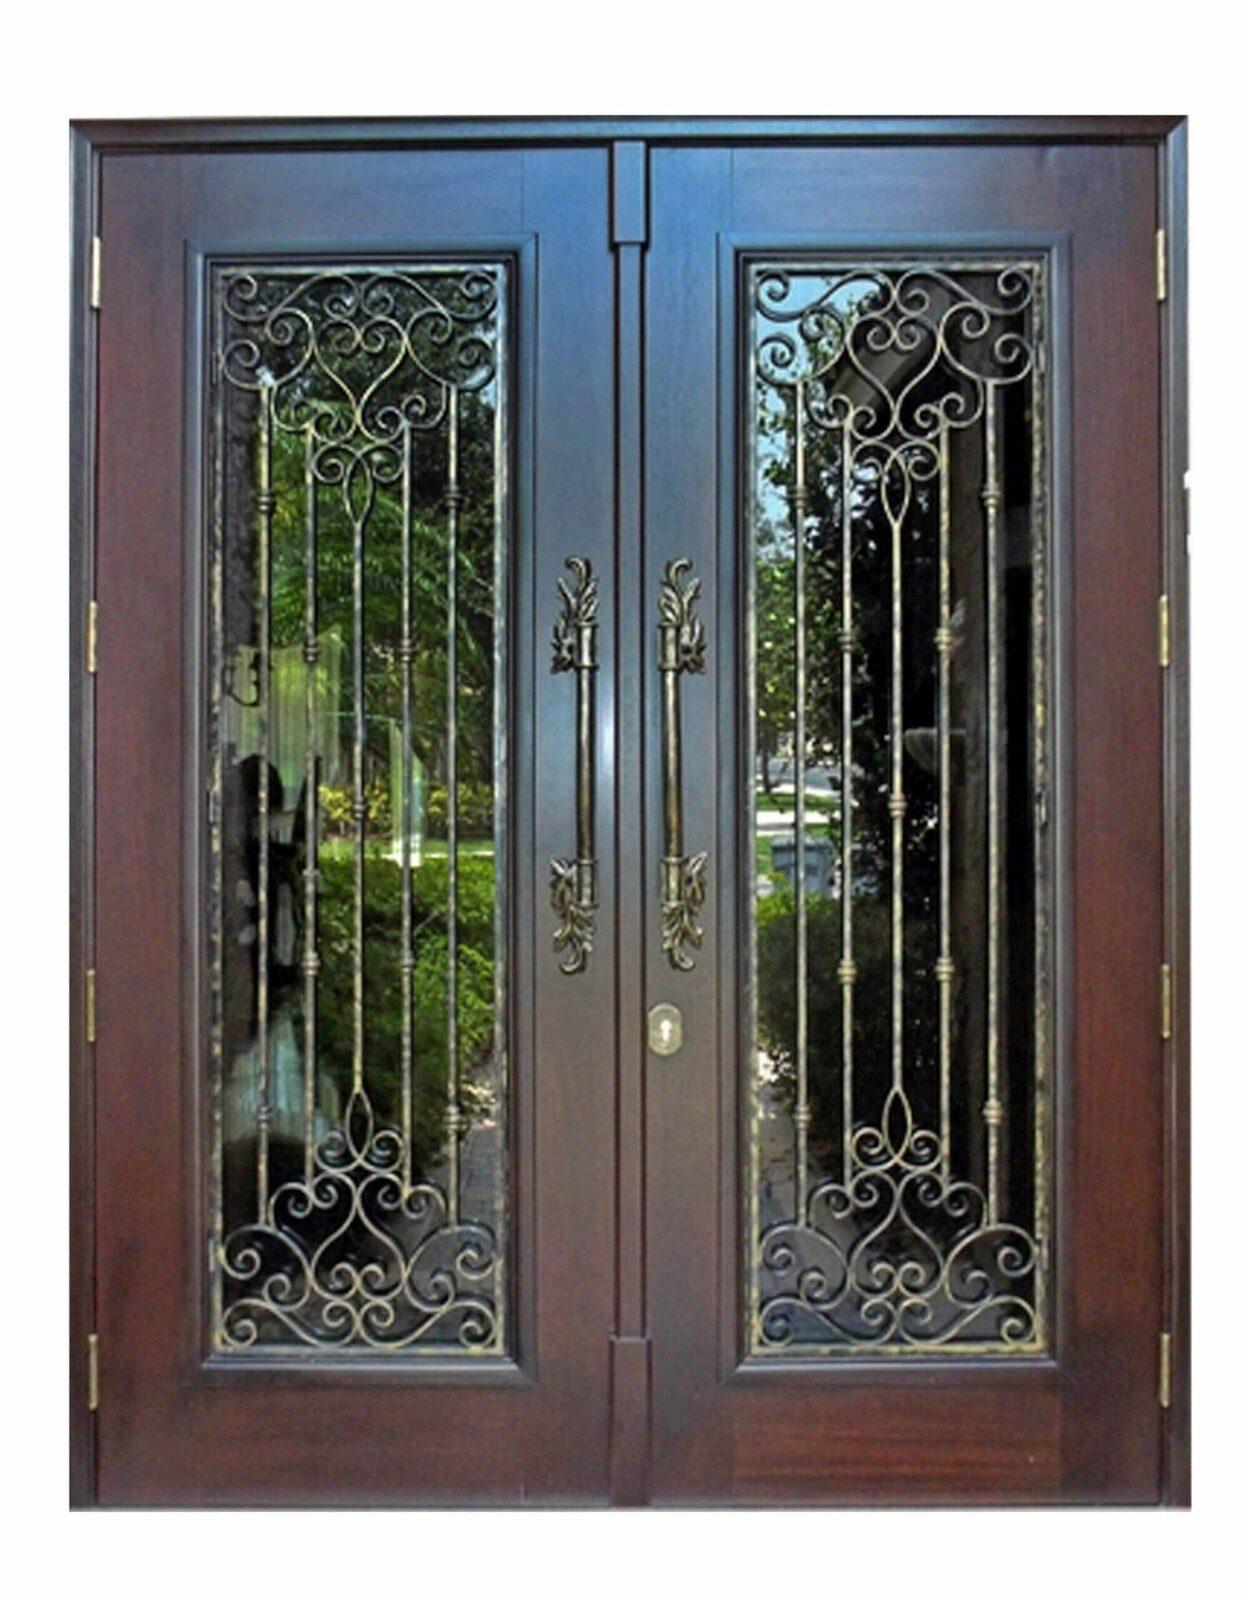 Golden Gate Mahogany Entrance Doors